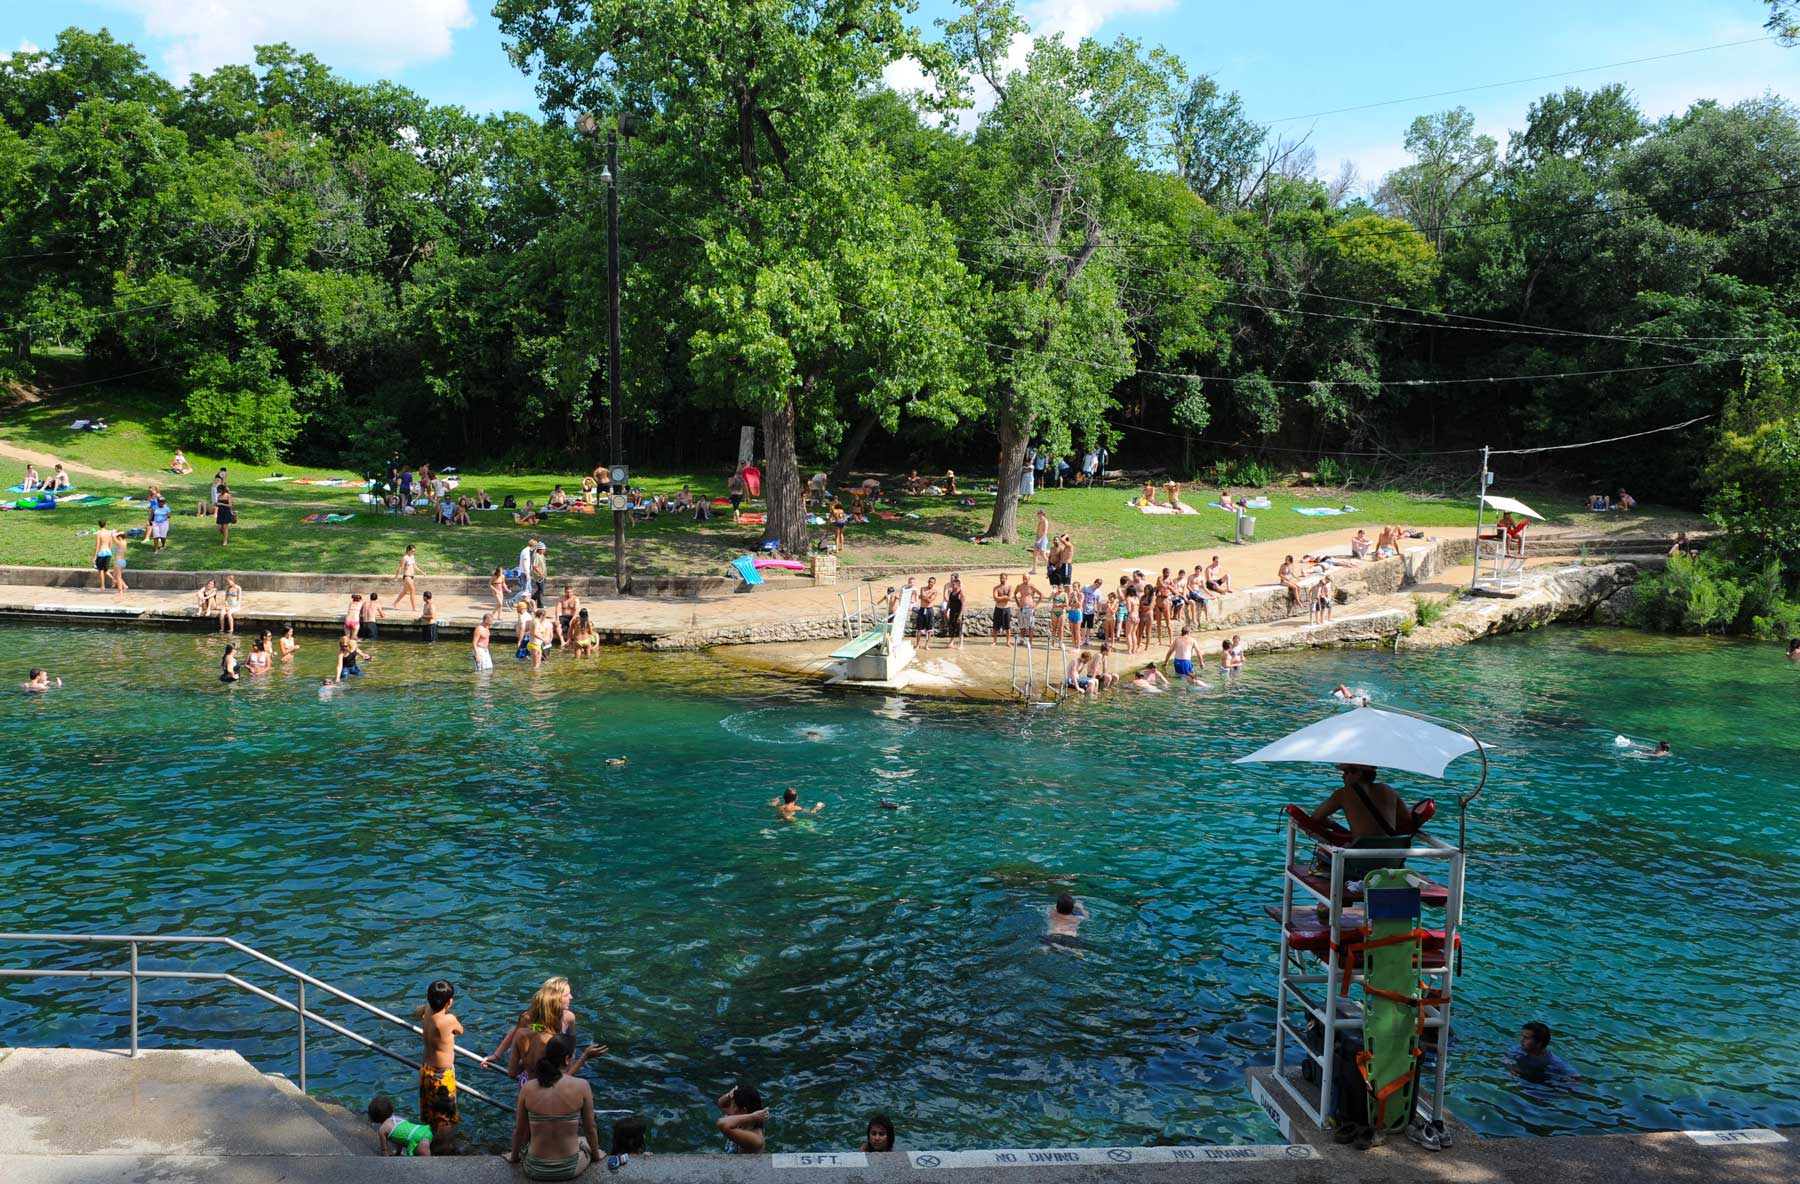 Austin Texas - Barton Springs Pool | Barton springs